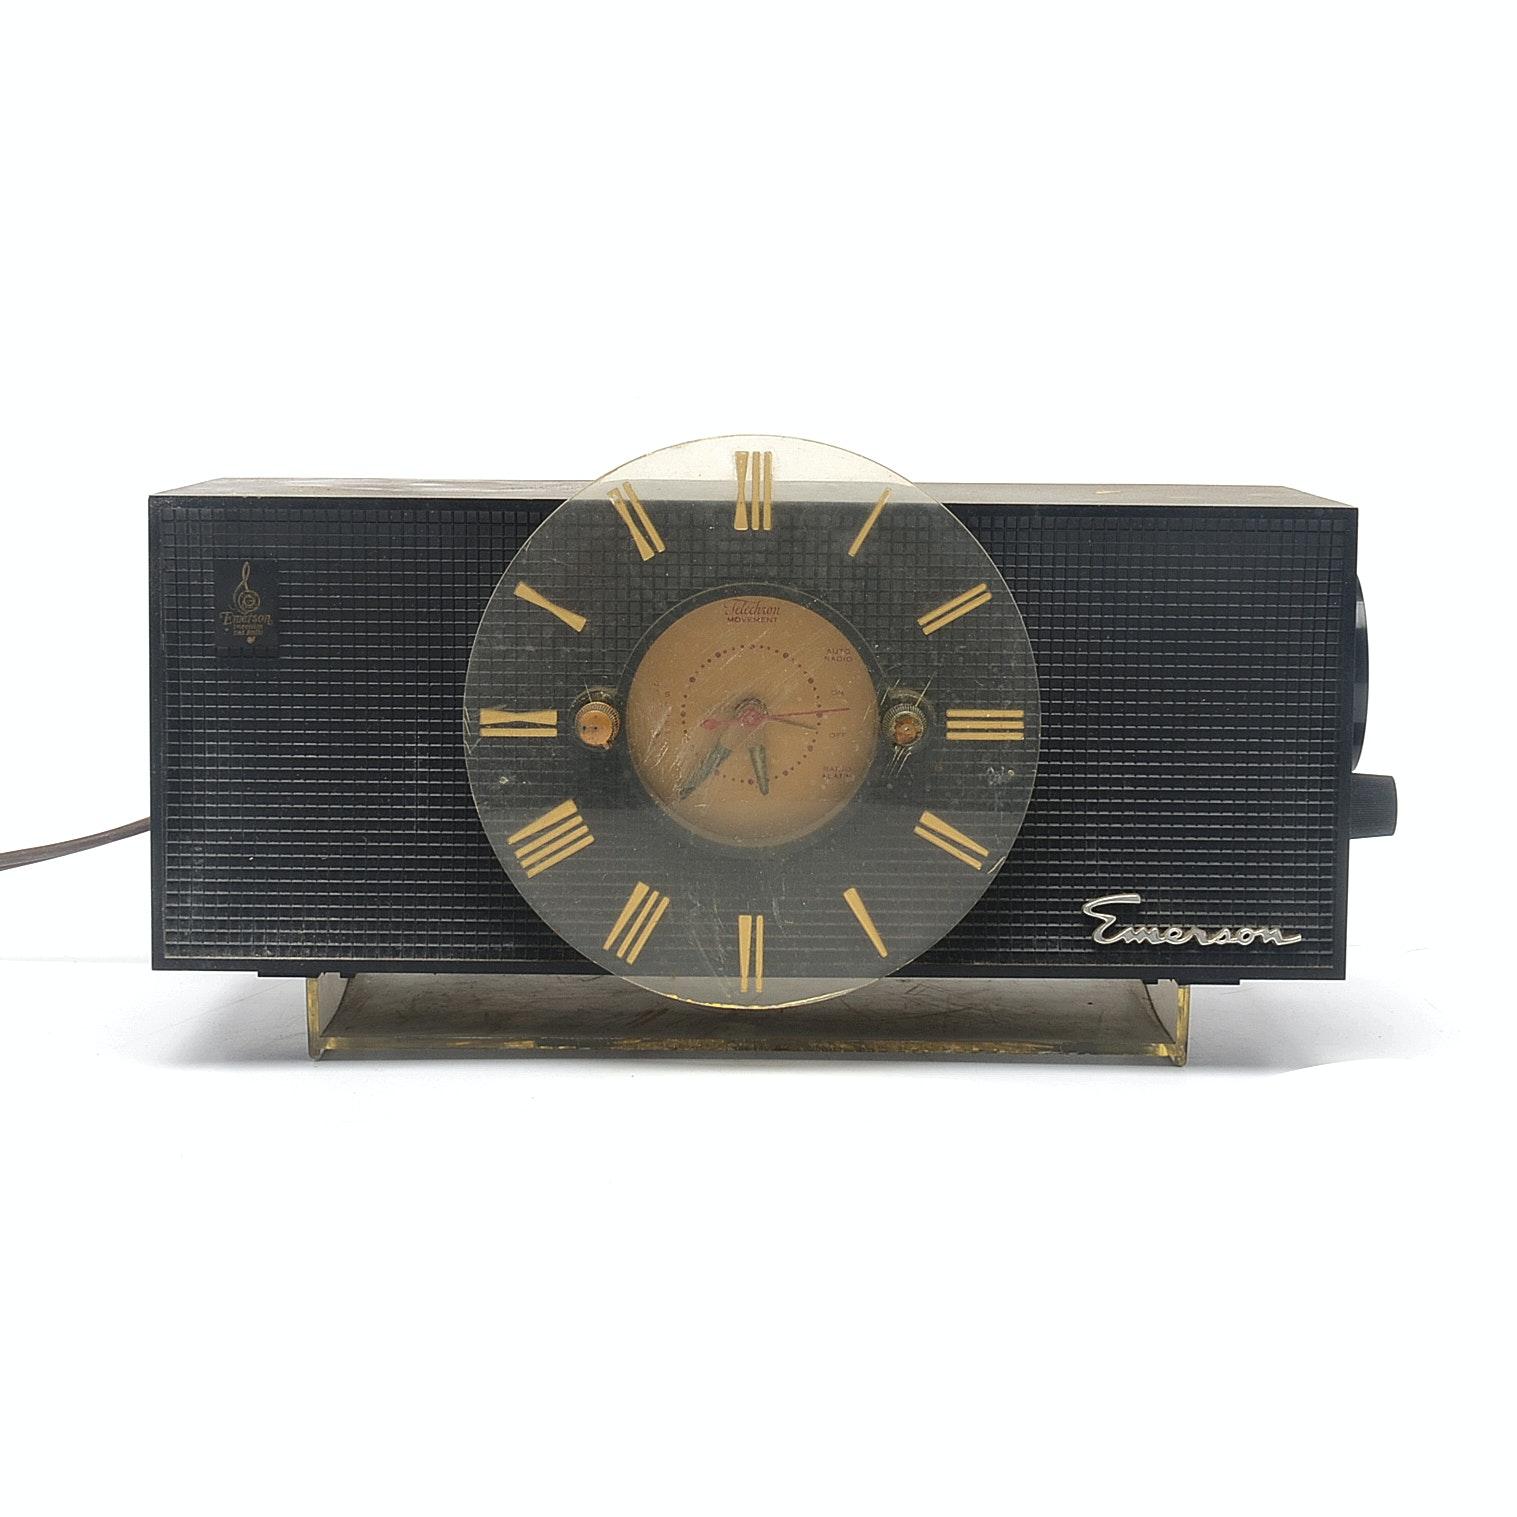 Emerson Radio with Clock